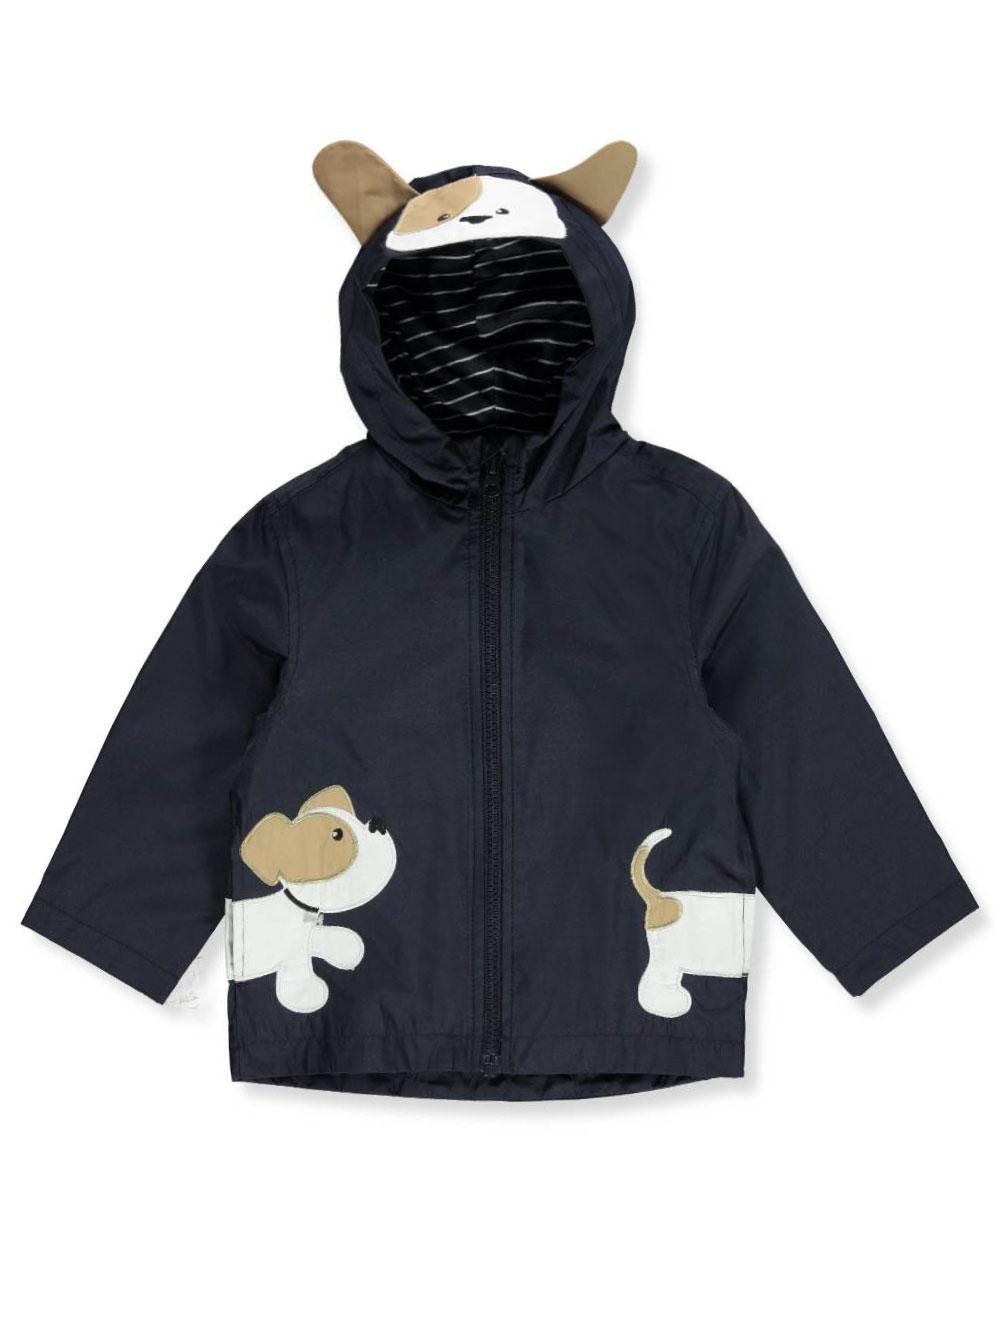 008af2f3e London Fog Baby Boys  Hooded Windbreaker Jacket